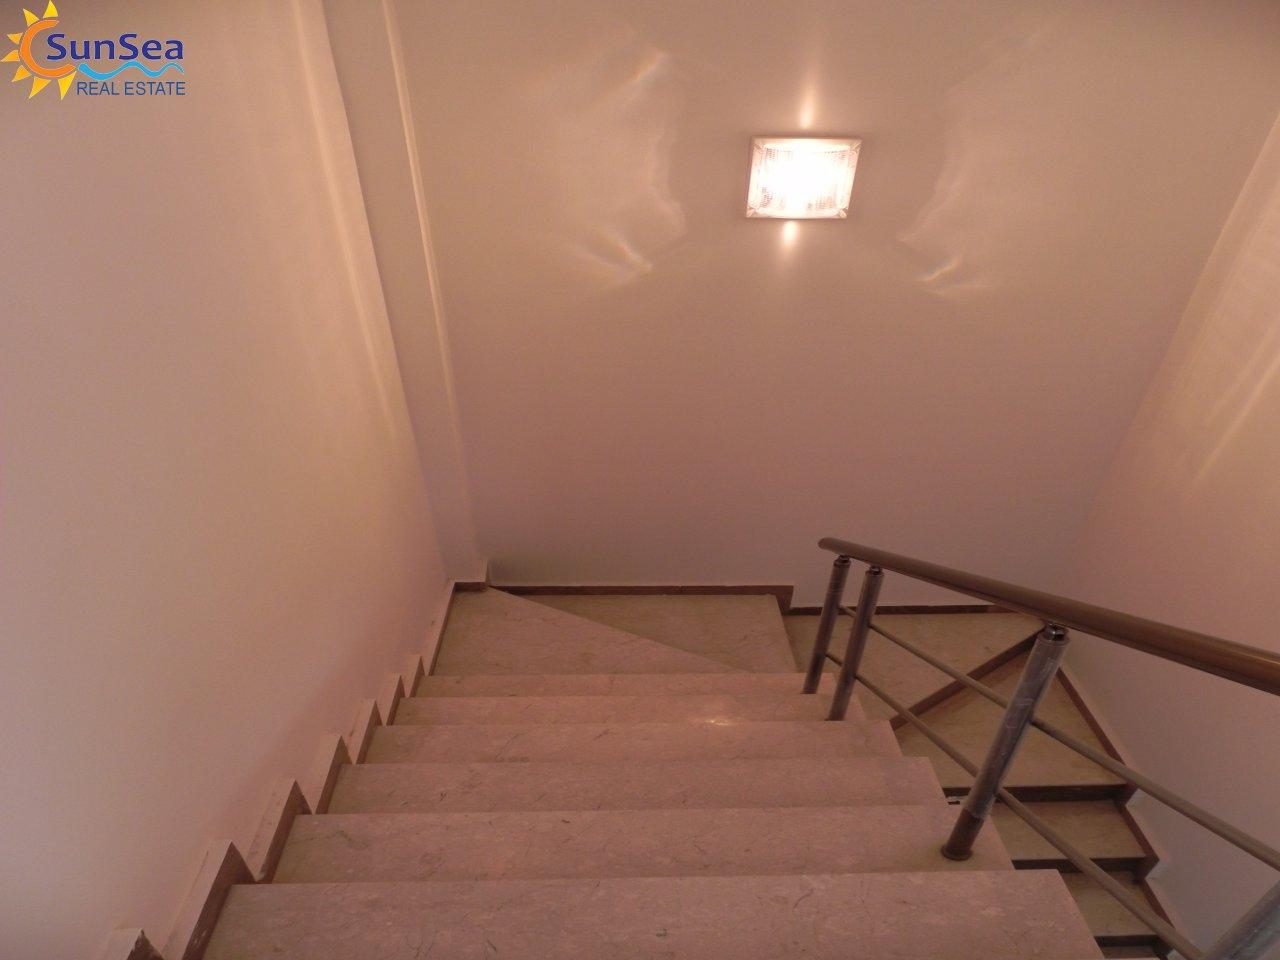 Kerem apart steps